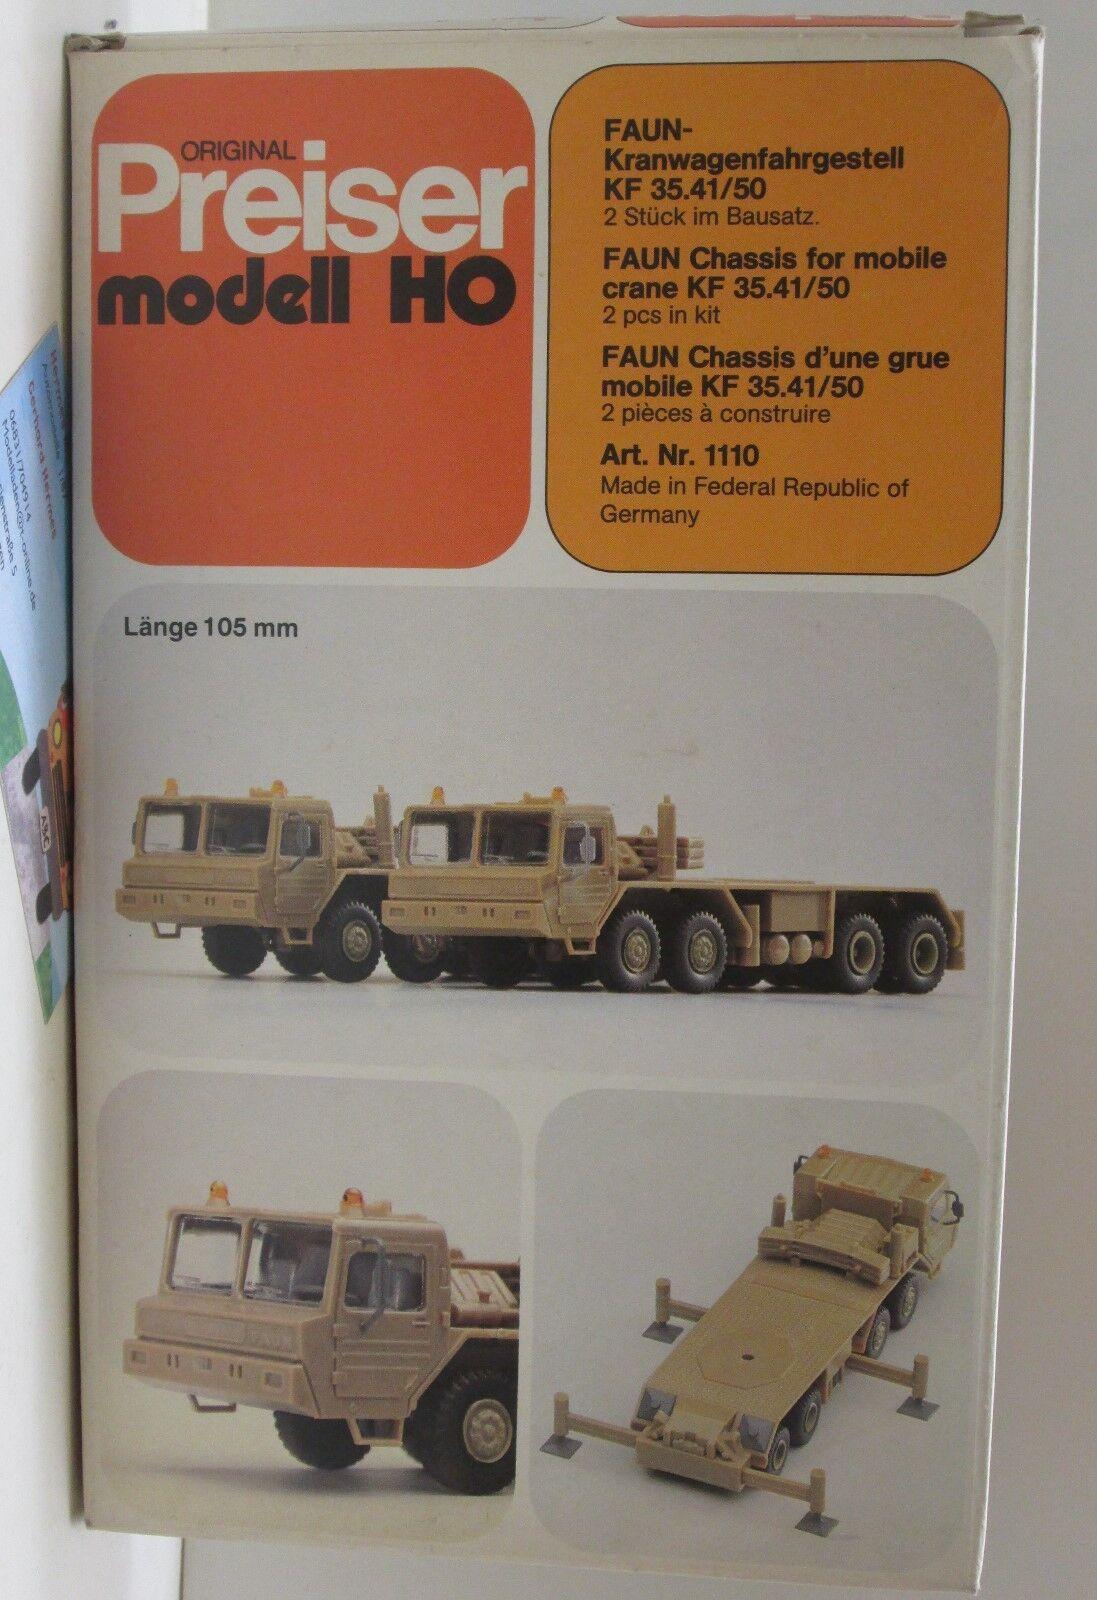 Preiser 1110  Faun kranwagenfahrgestell KF 35.41 50, 50, 50, 2 unidades en el kit 1 87 7943c7